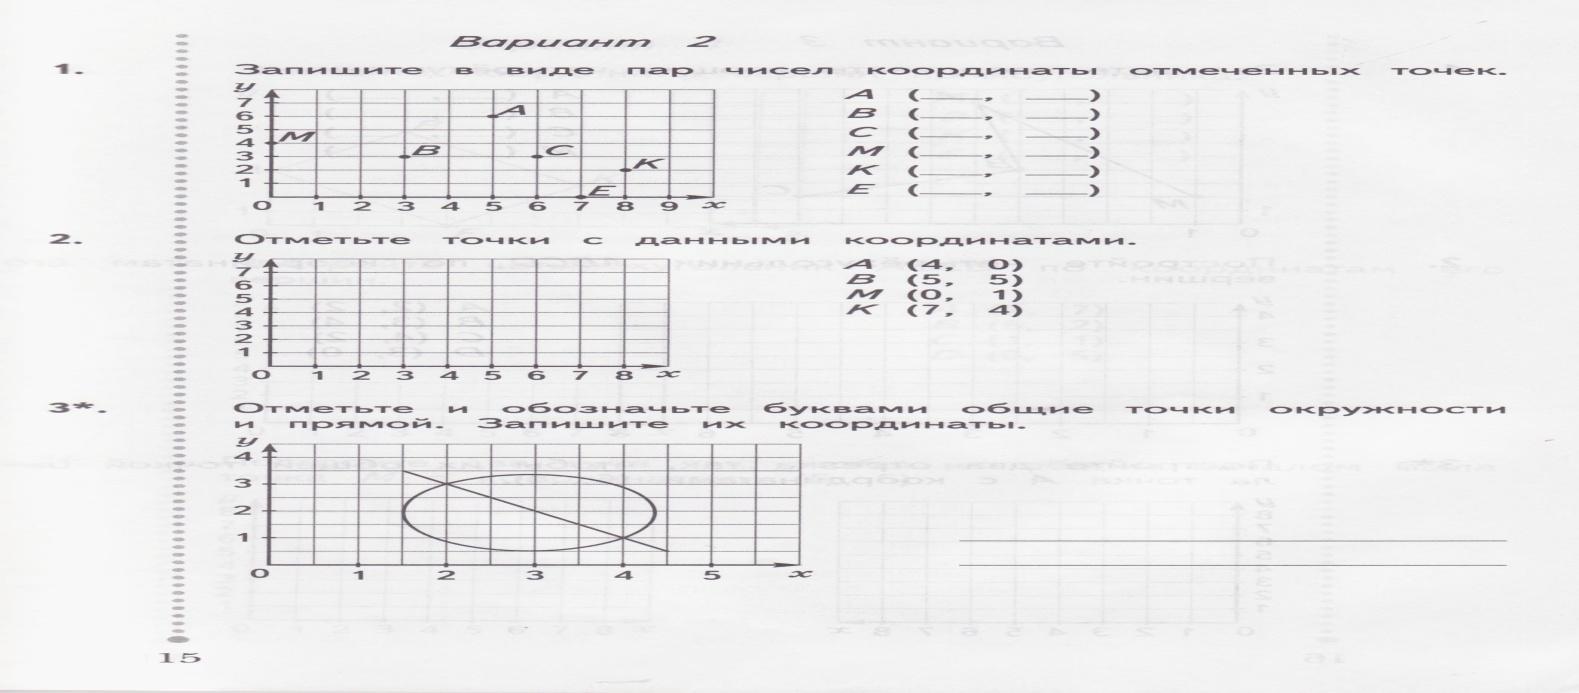 C:\Users\user\Documents\20.10.2вариант 001.jpg